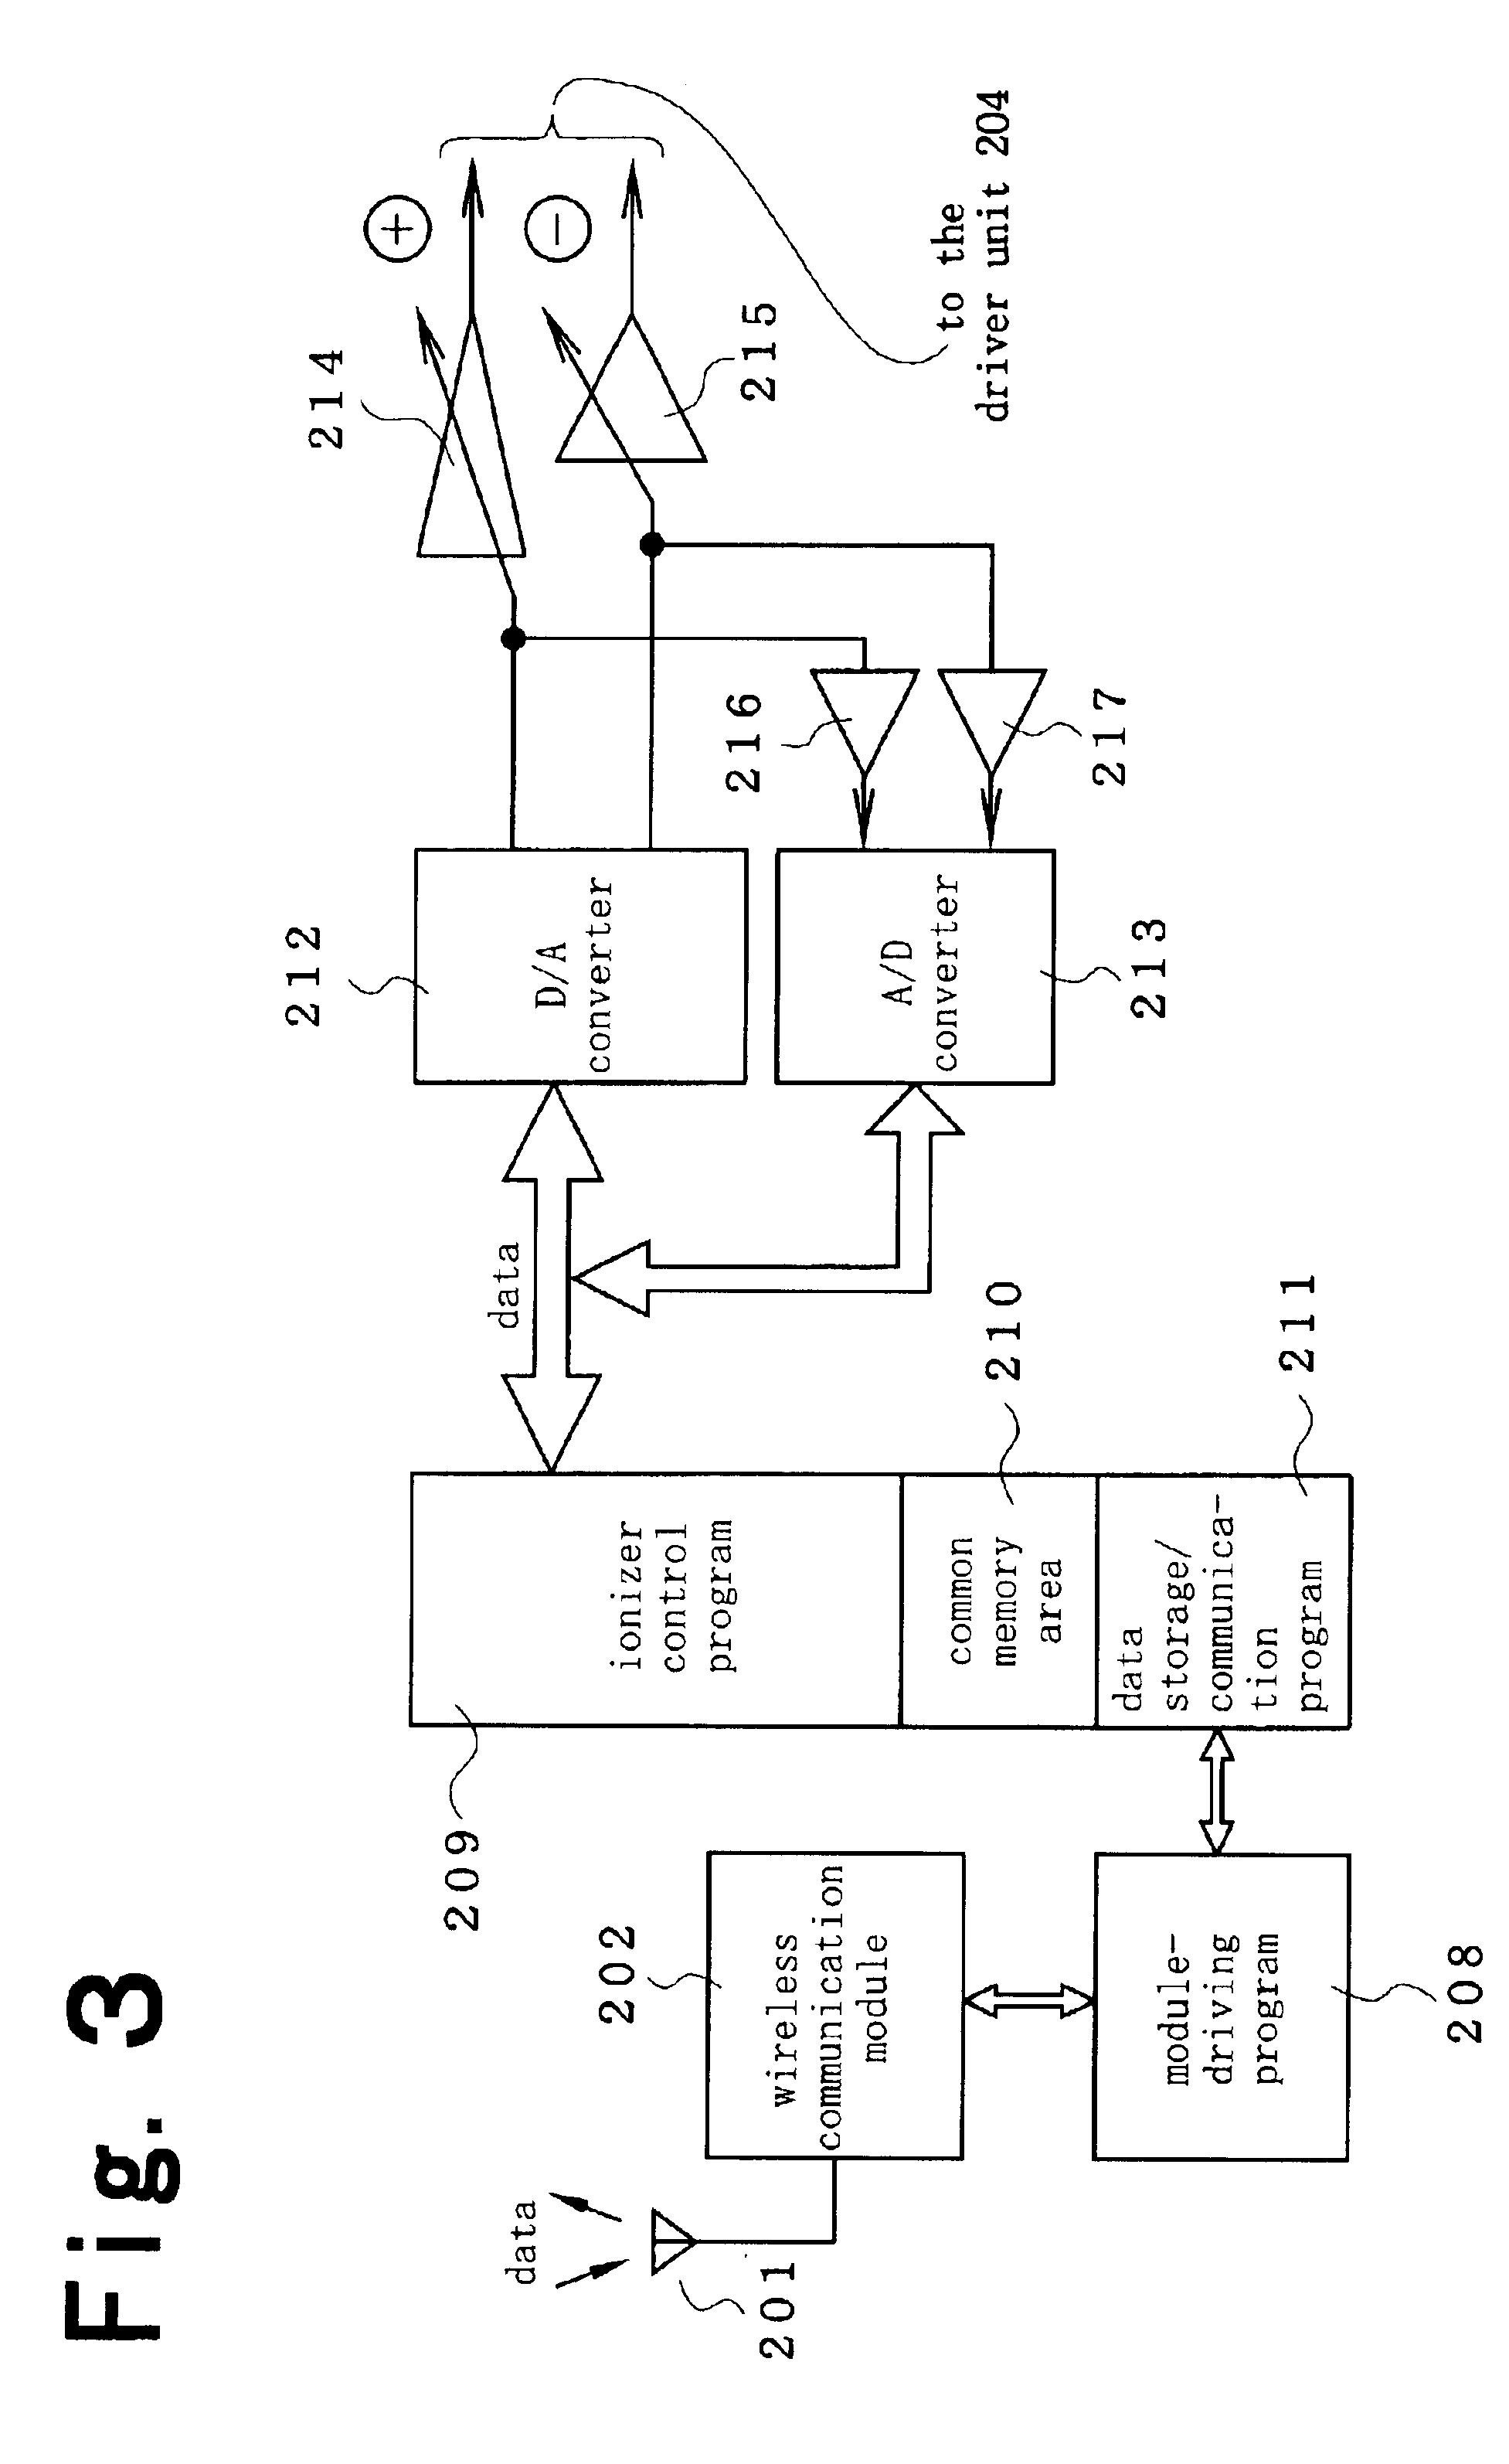 patent us6781811 - ionizer control system